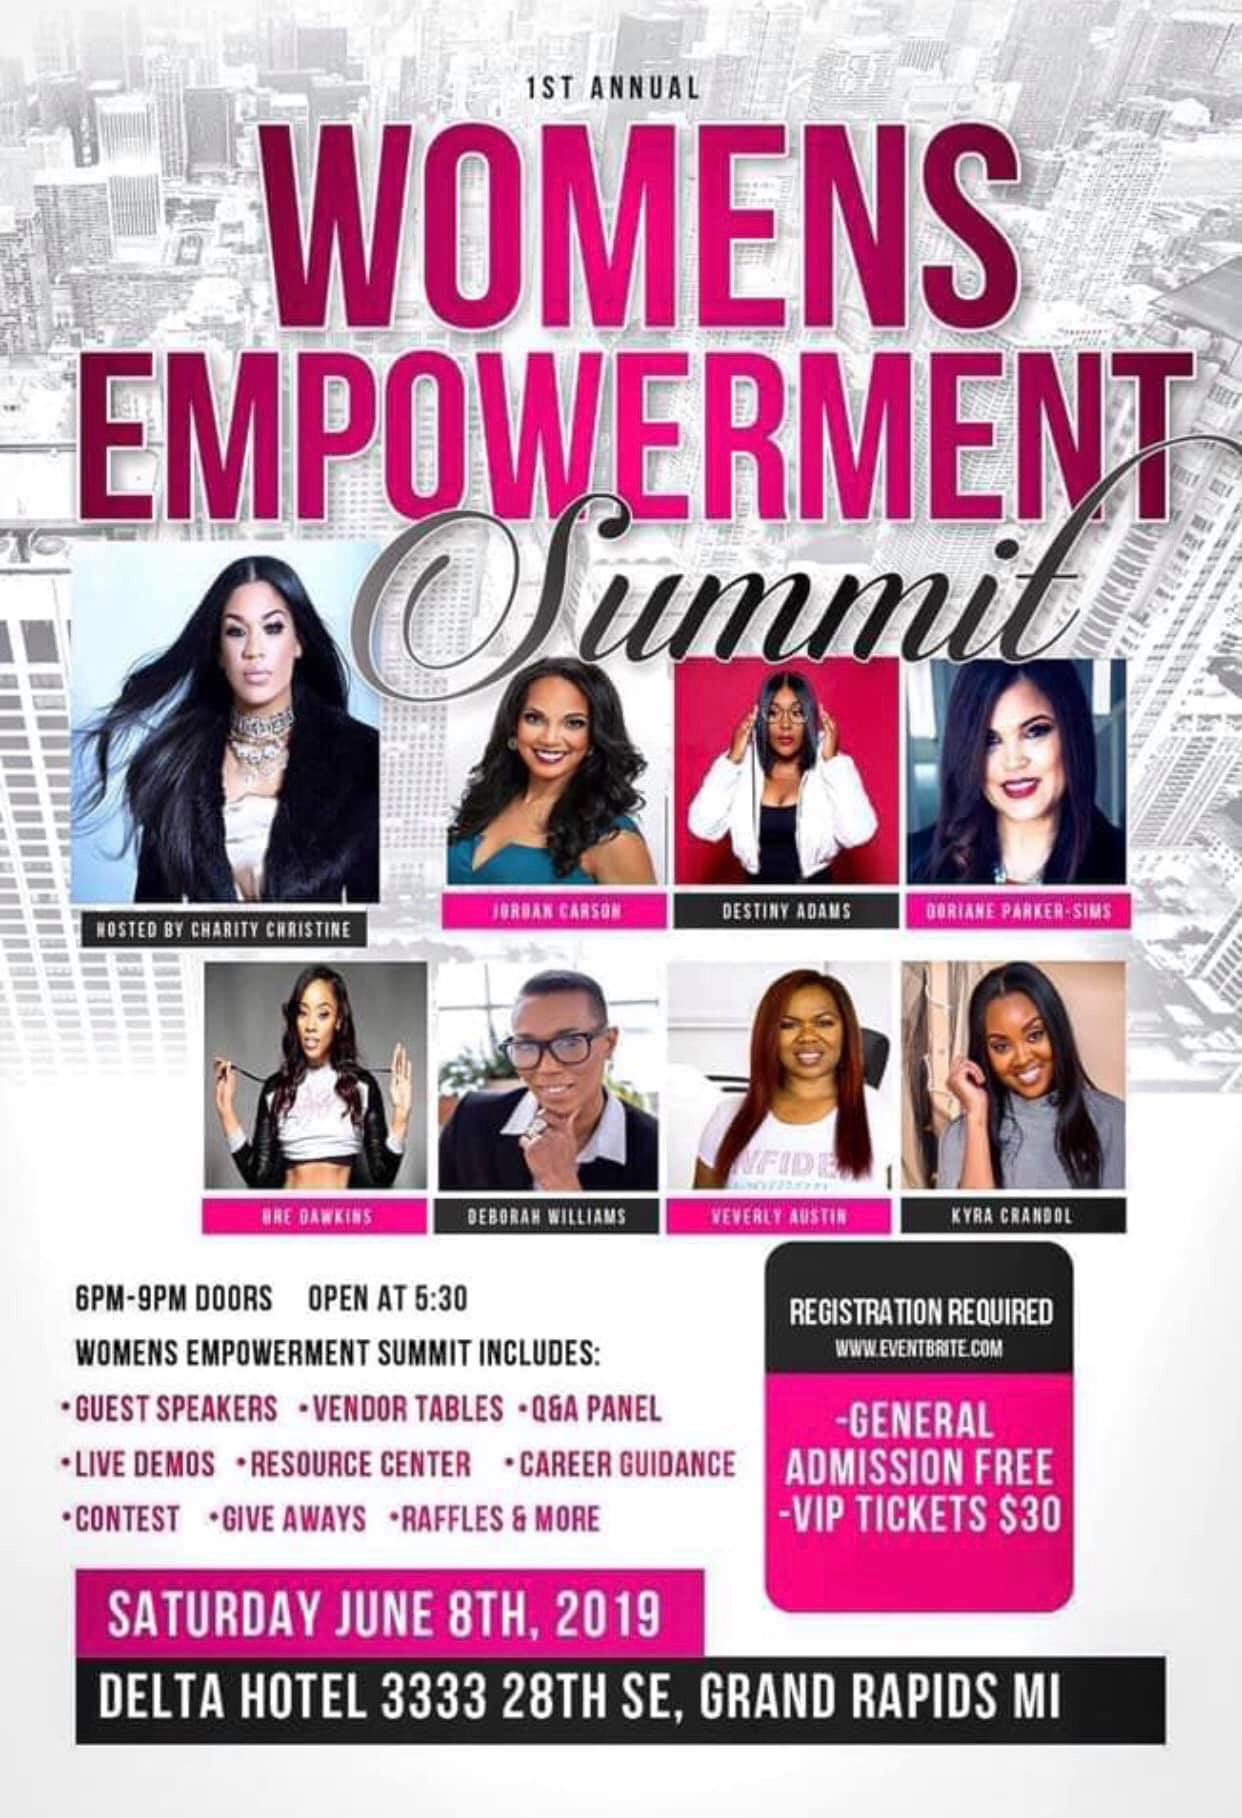 Womens Empowermetn Summit.JPG